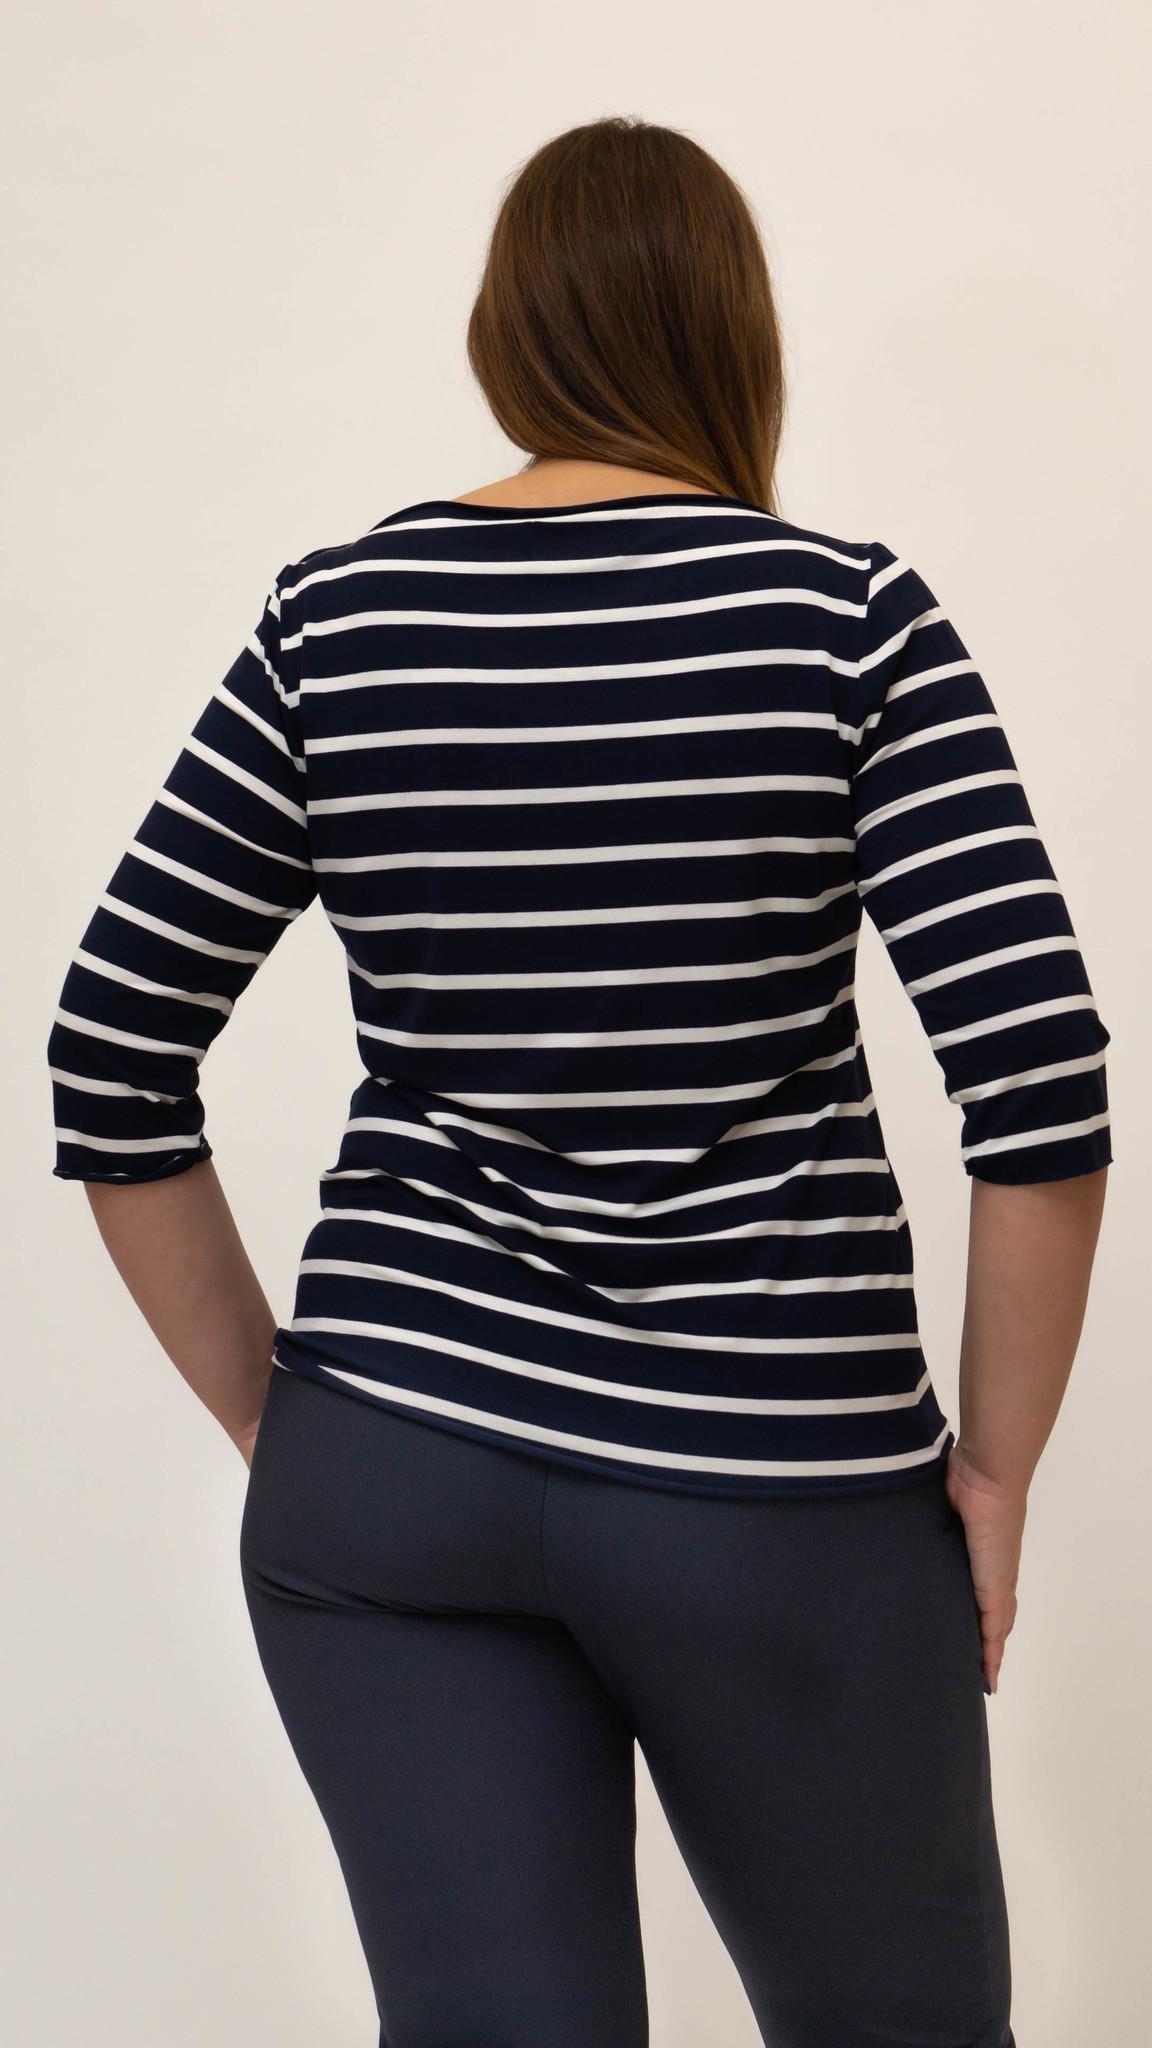 MARIETTE Shirt in Jersey-5